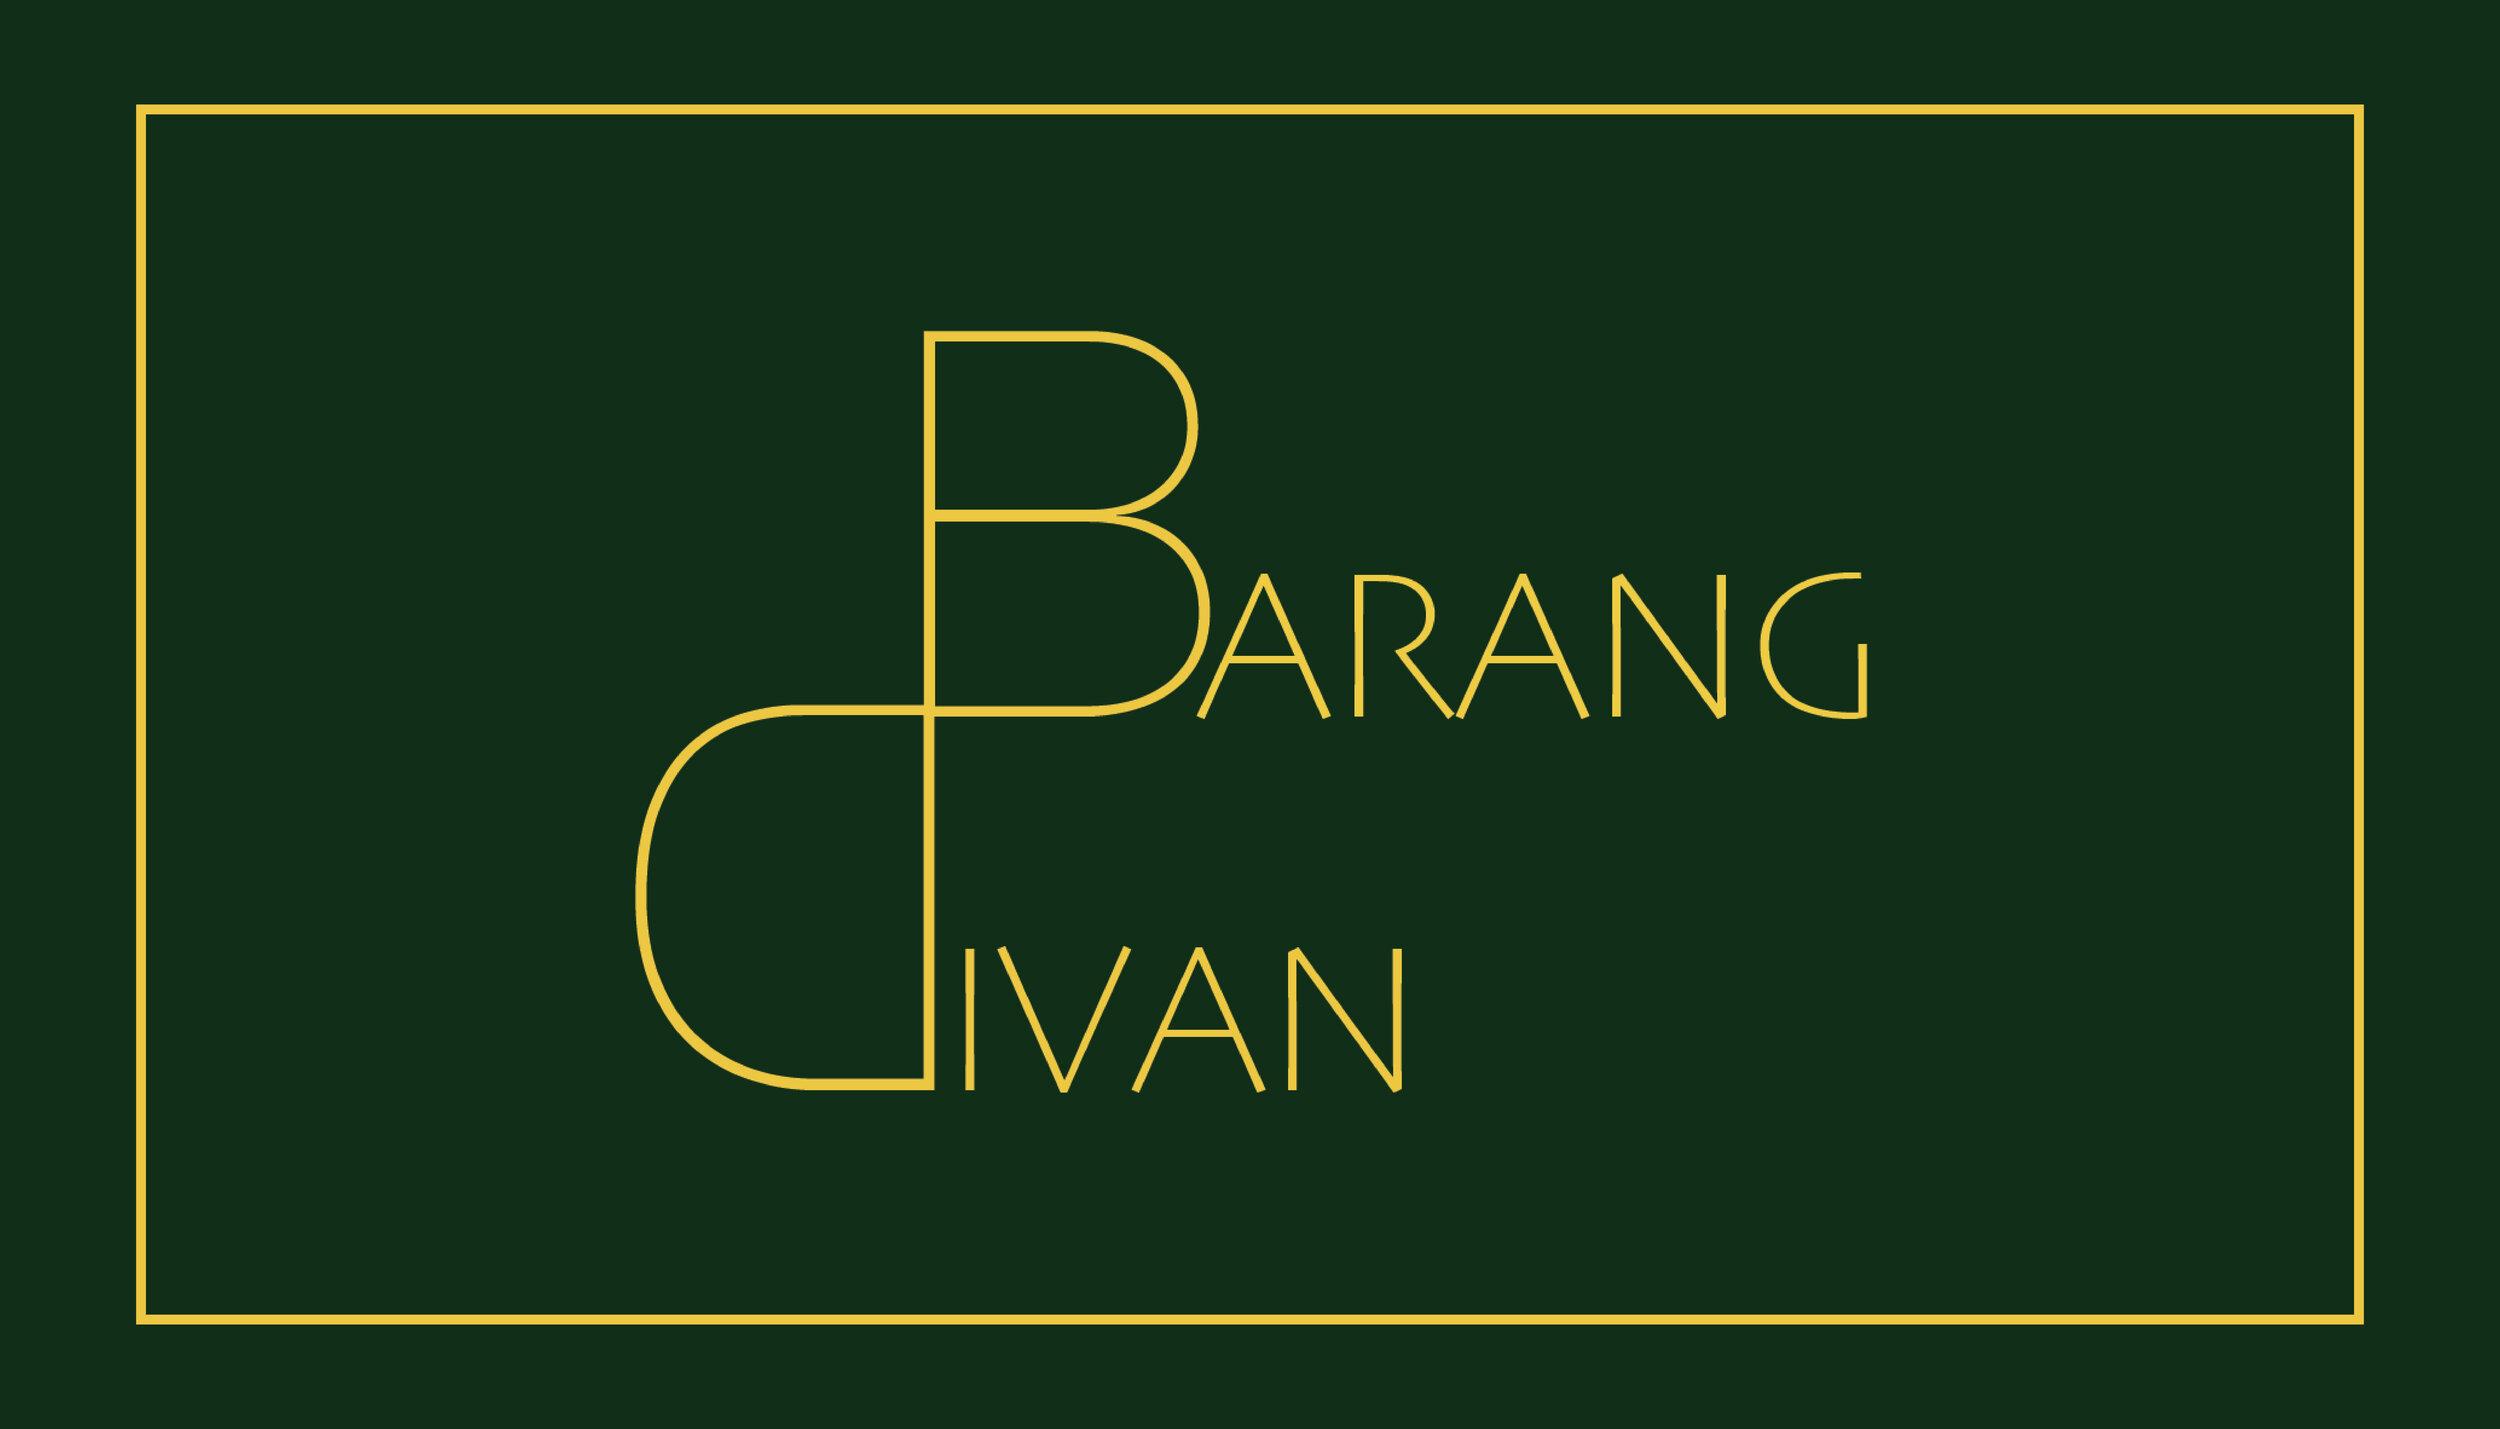 Barang Divan Business Cards.jpg